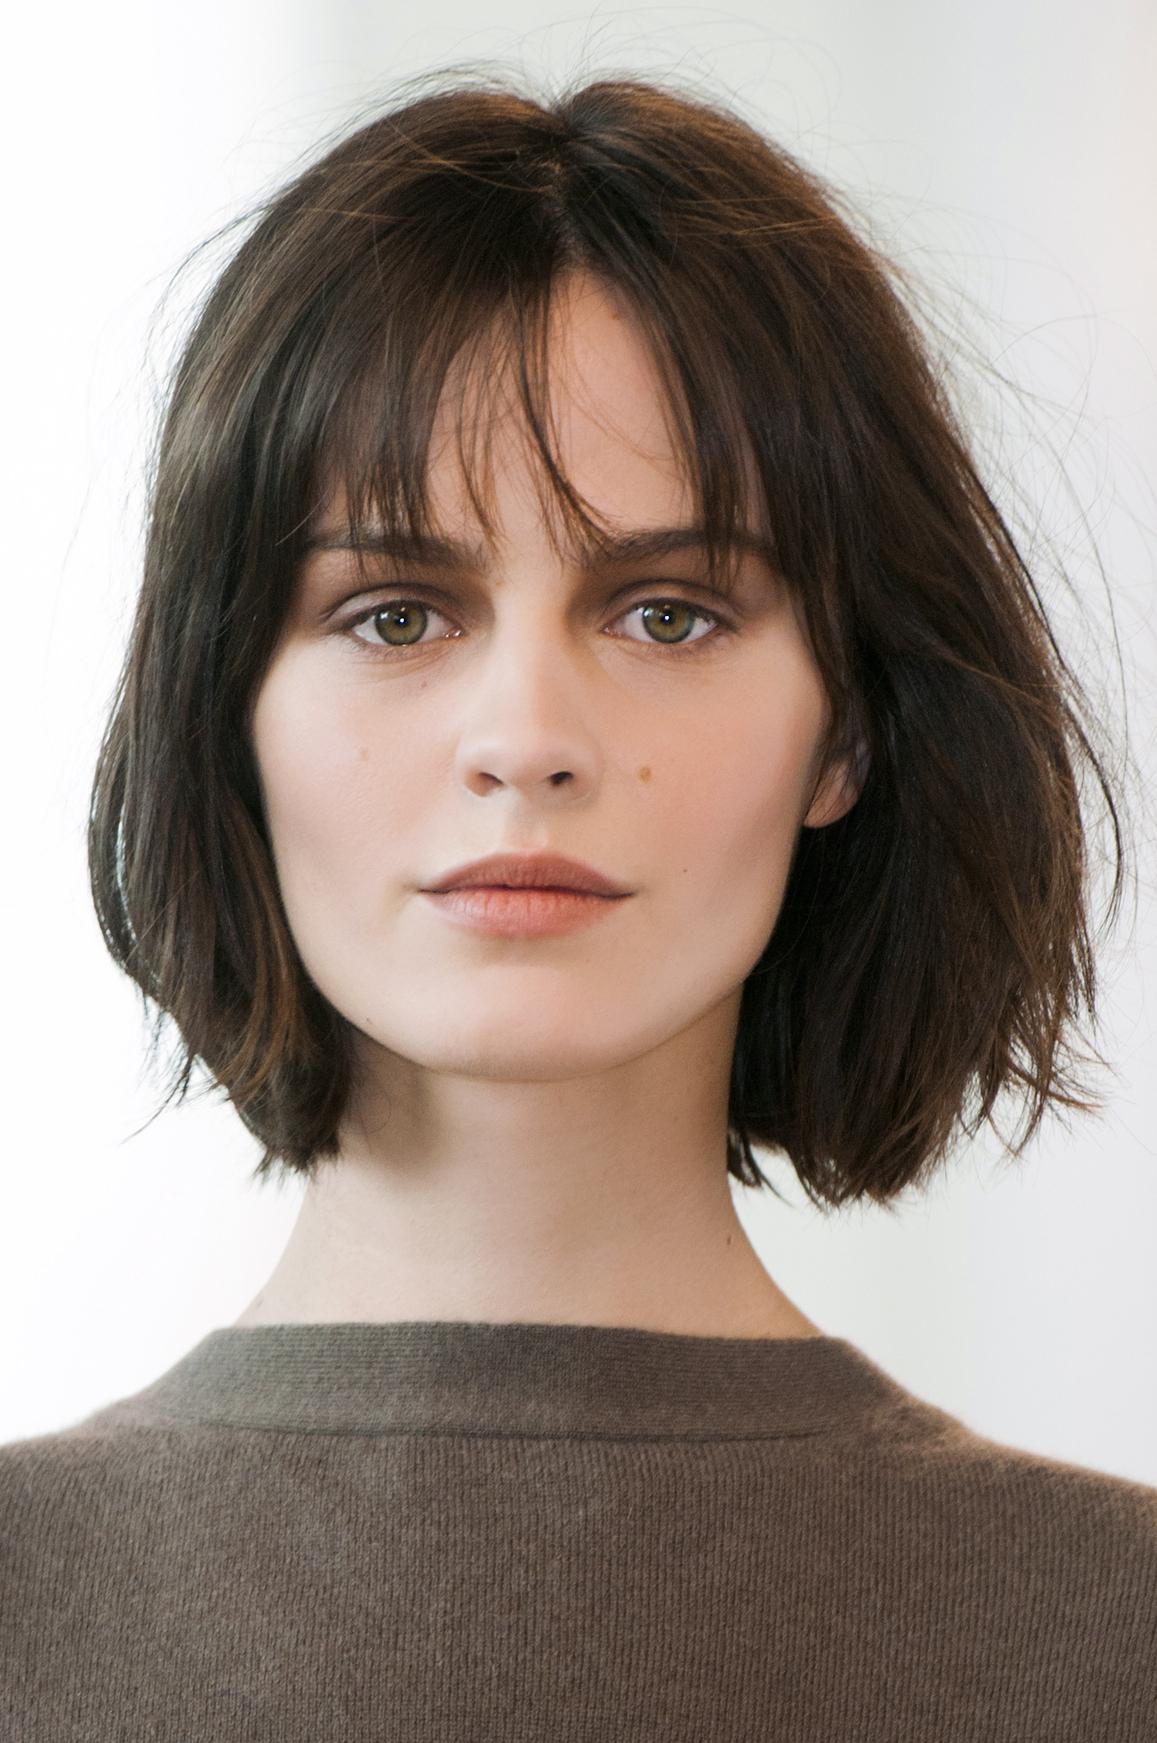 Choppy Short Hairstyles For Older Women – Hair World Magazine For Choppy Short Hairstyles For Older Women (View 24 of 25)